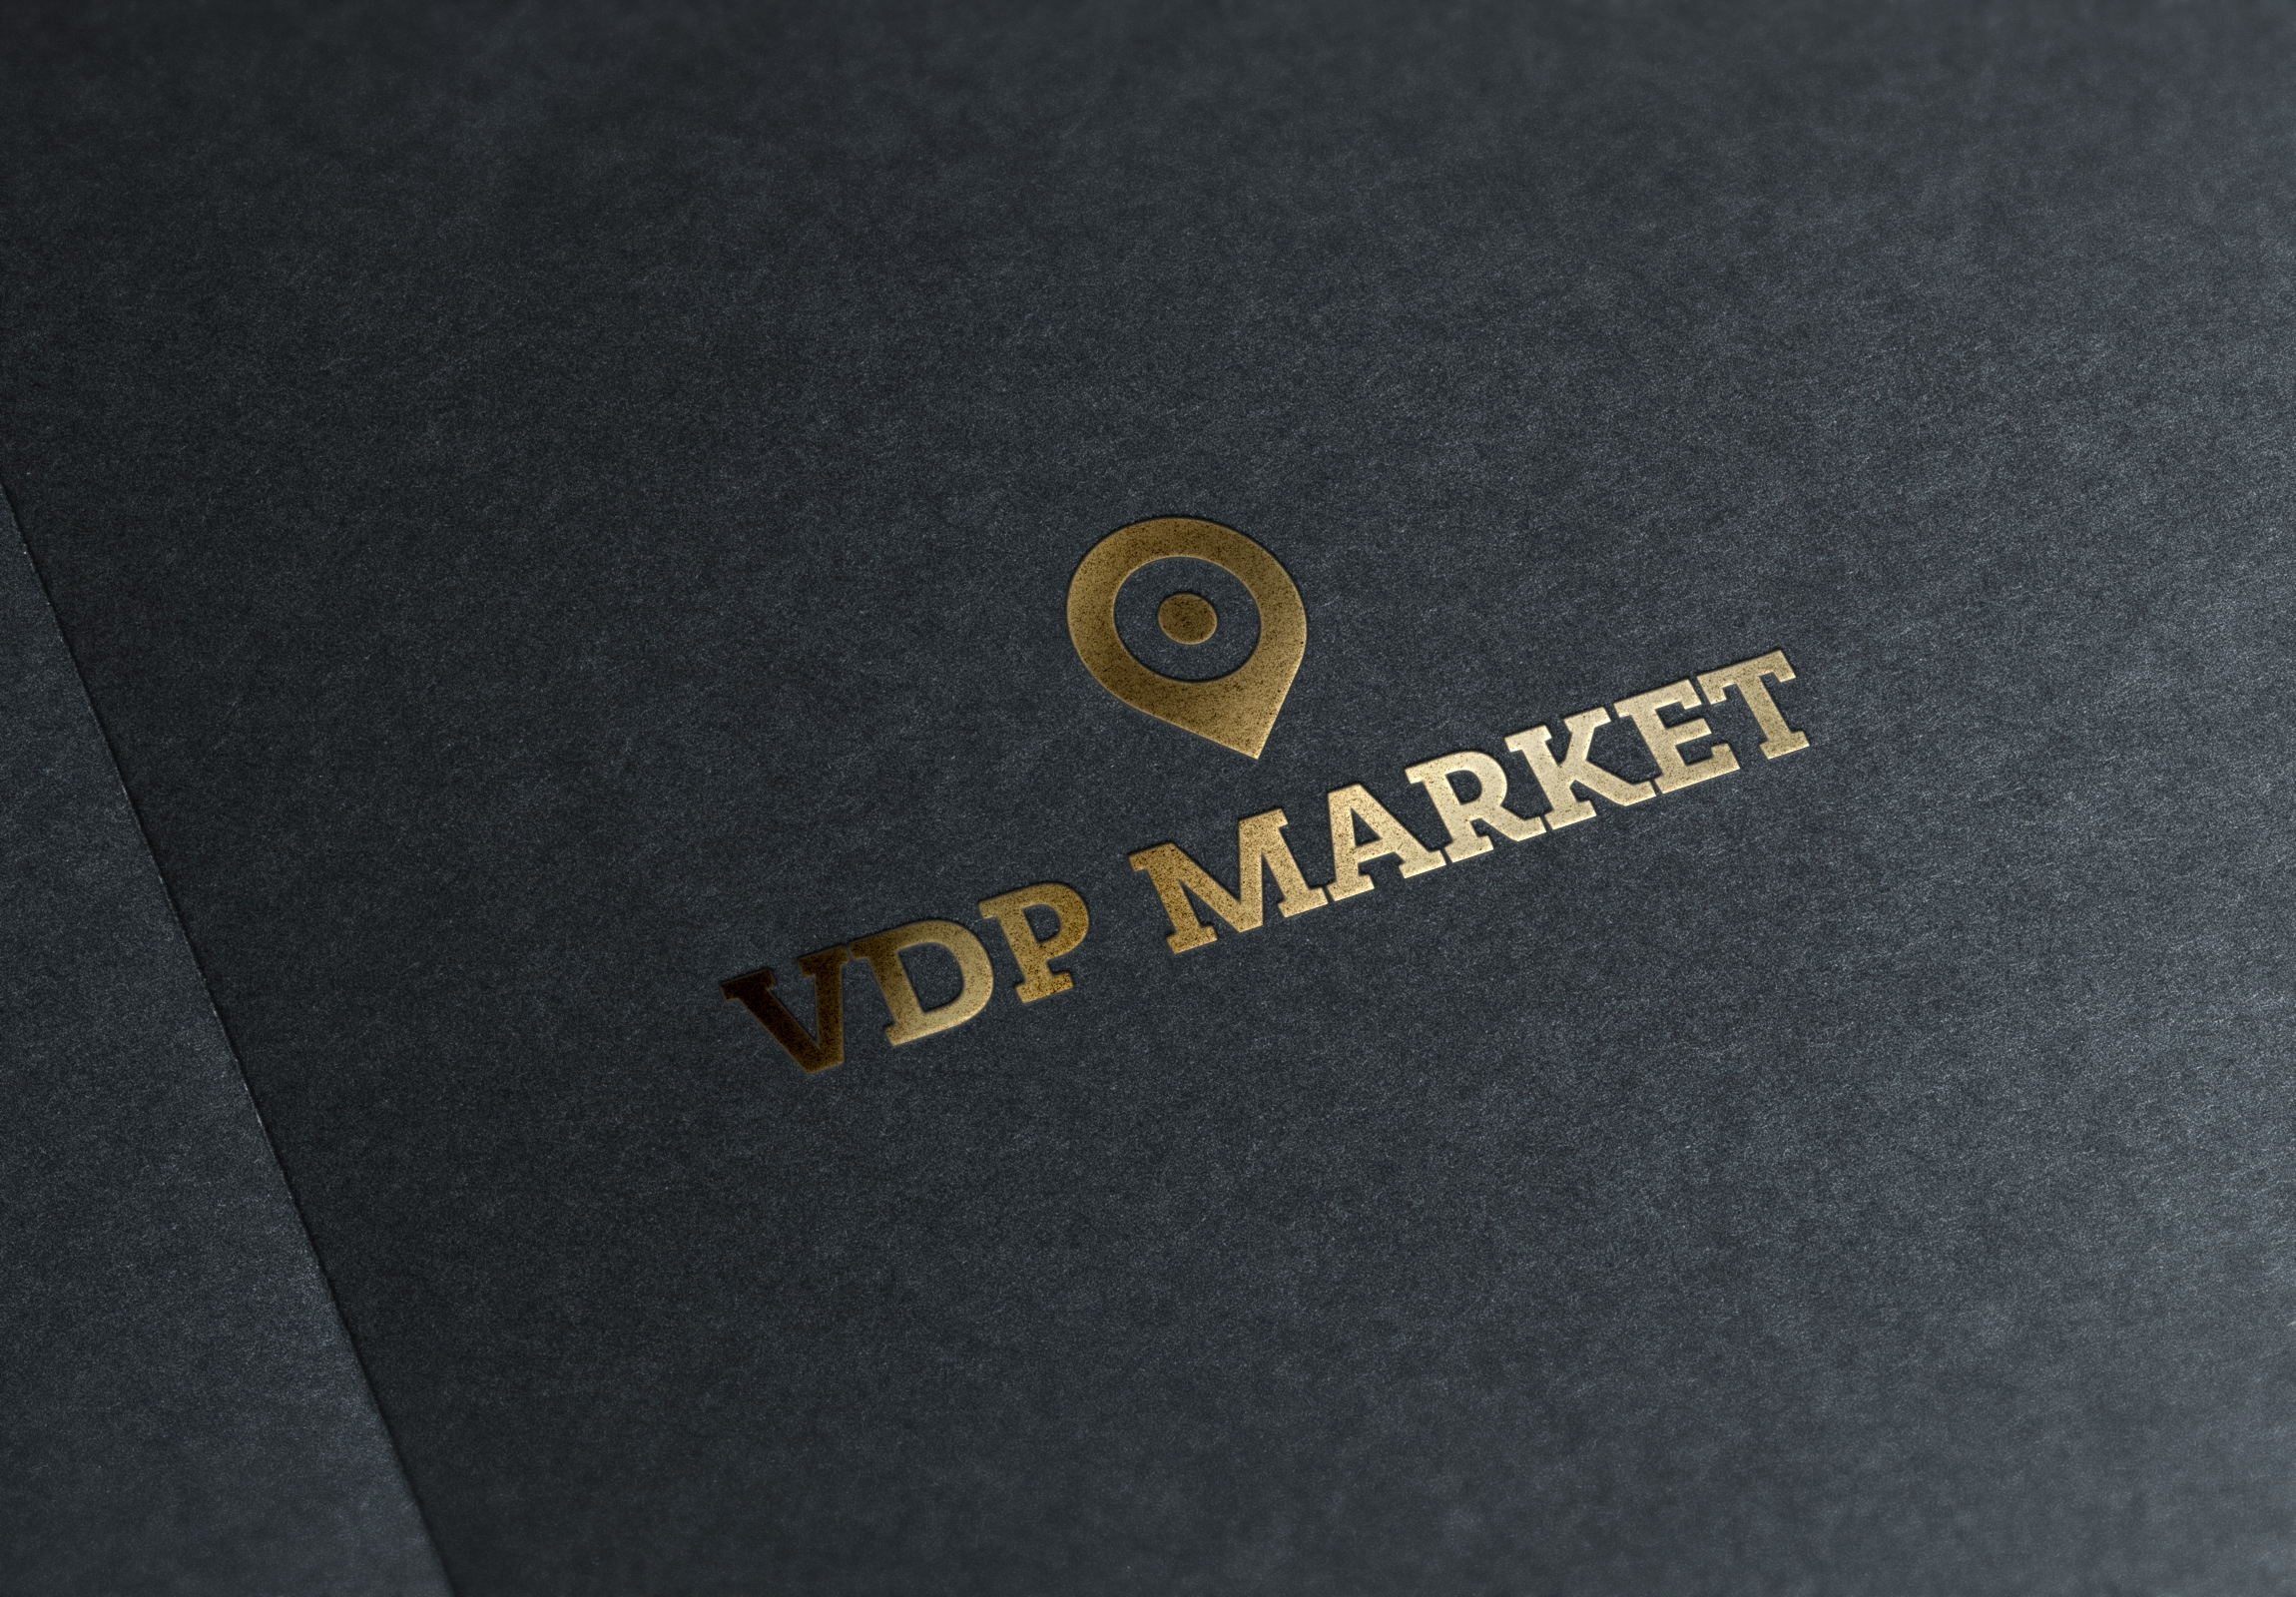 VDP market 2